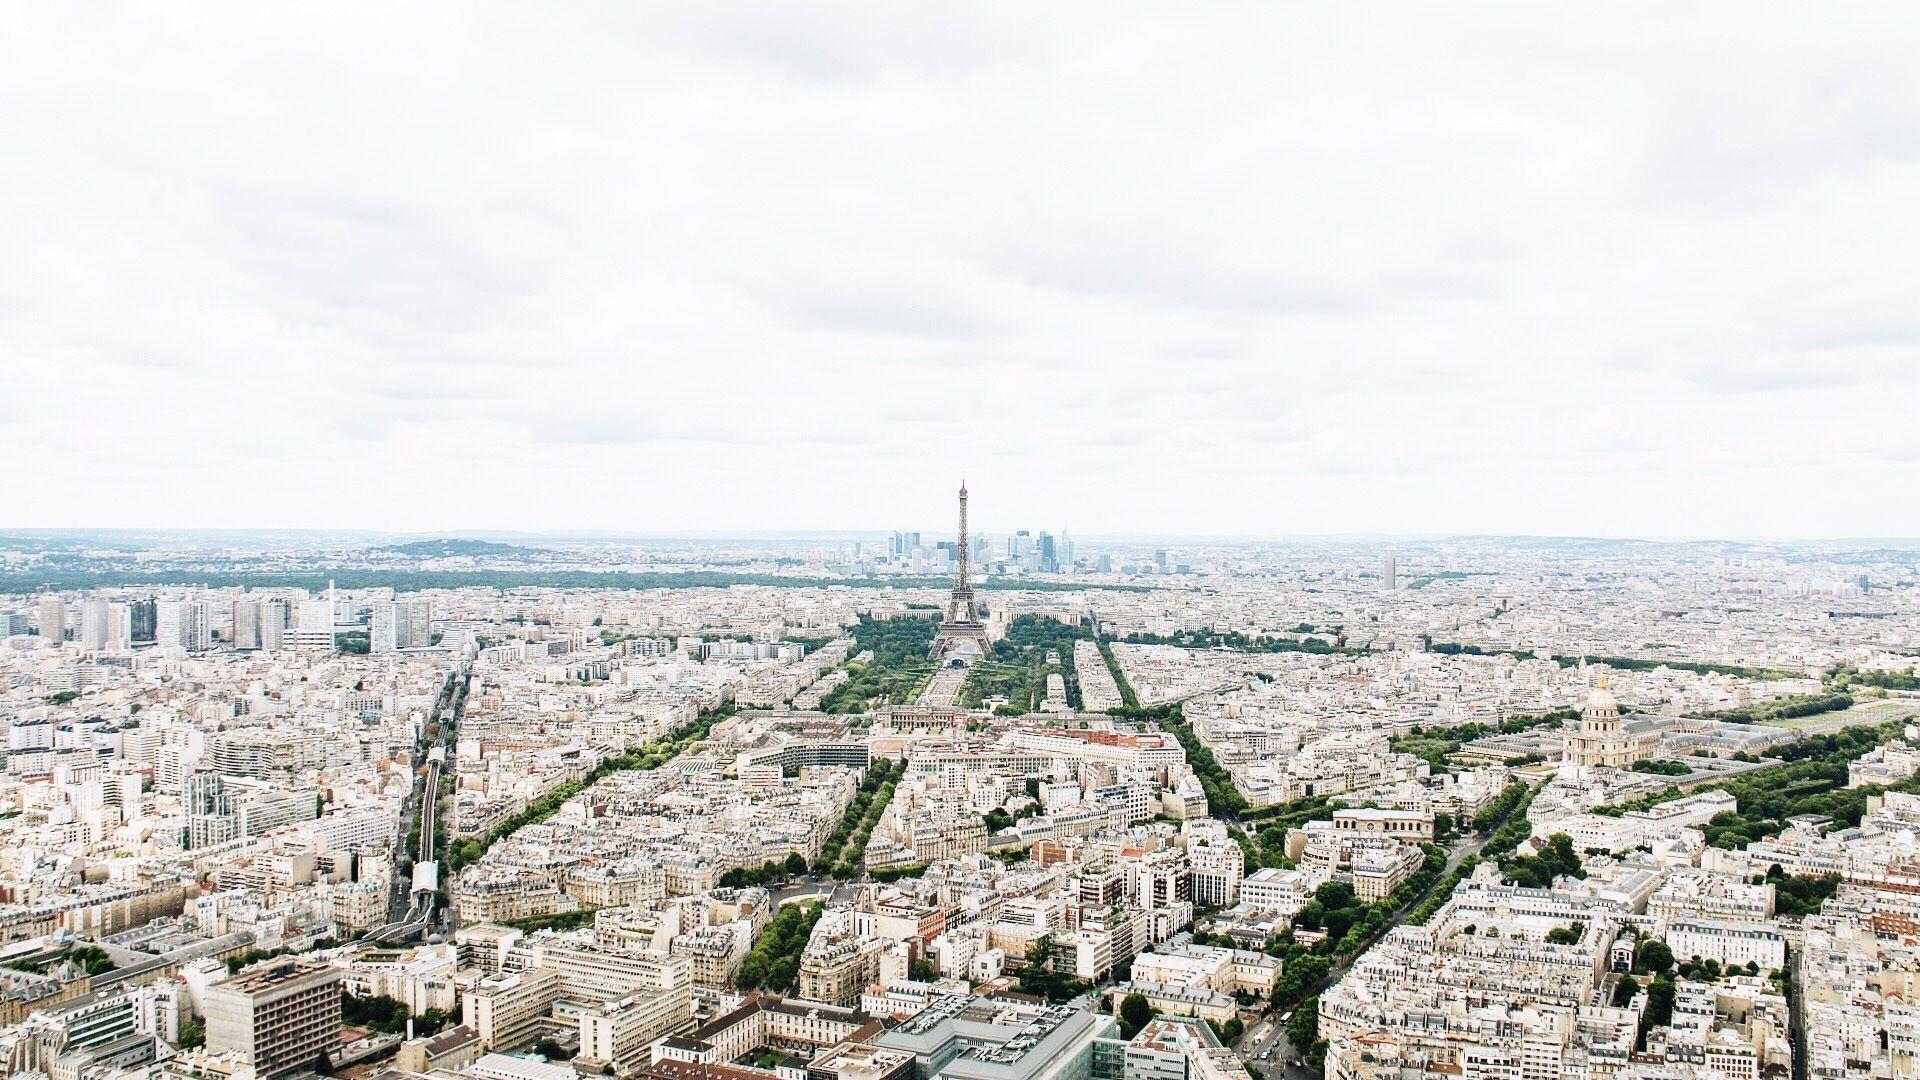 Eiffel Tower Paris view from Montparnasse Tower